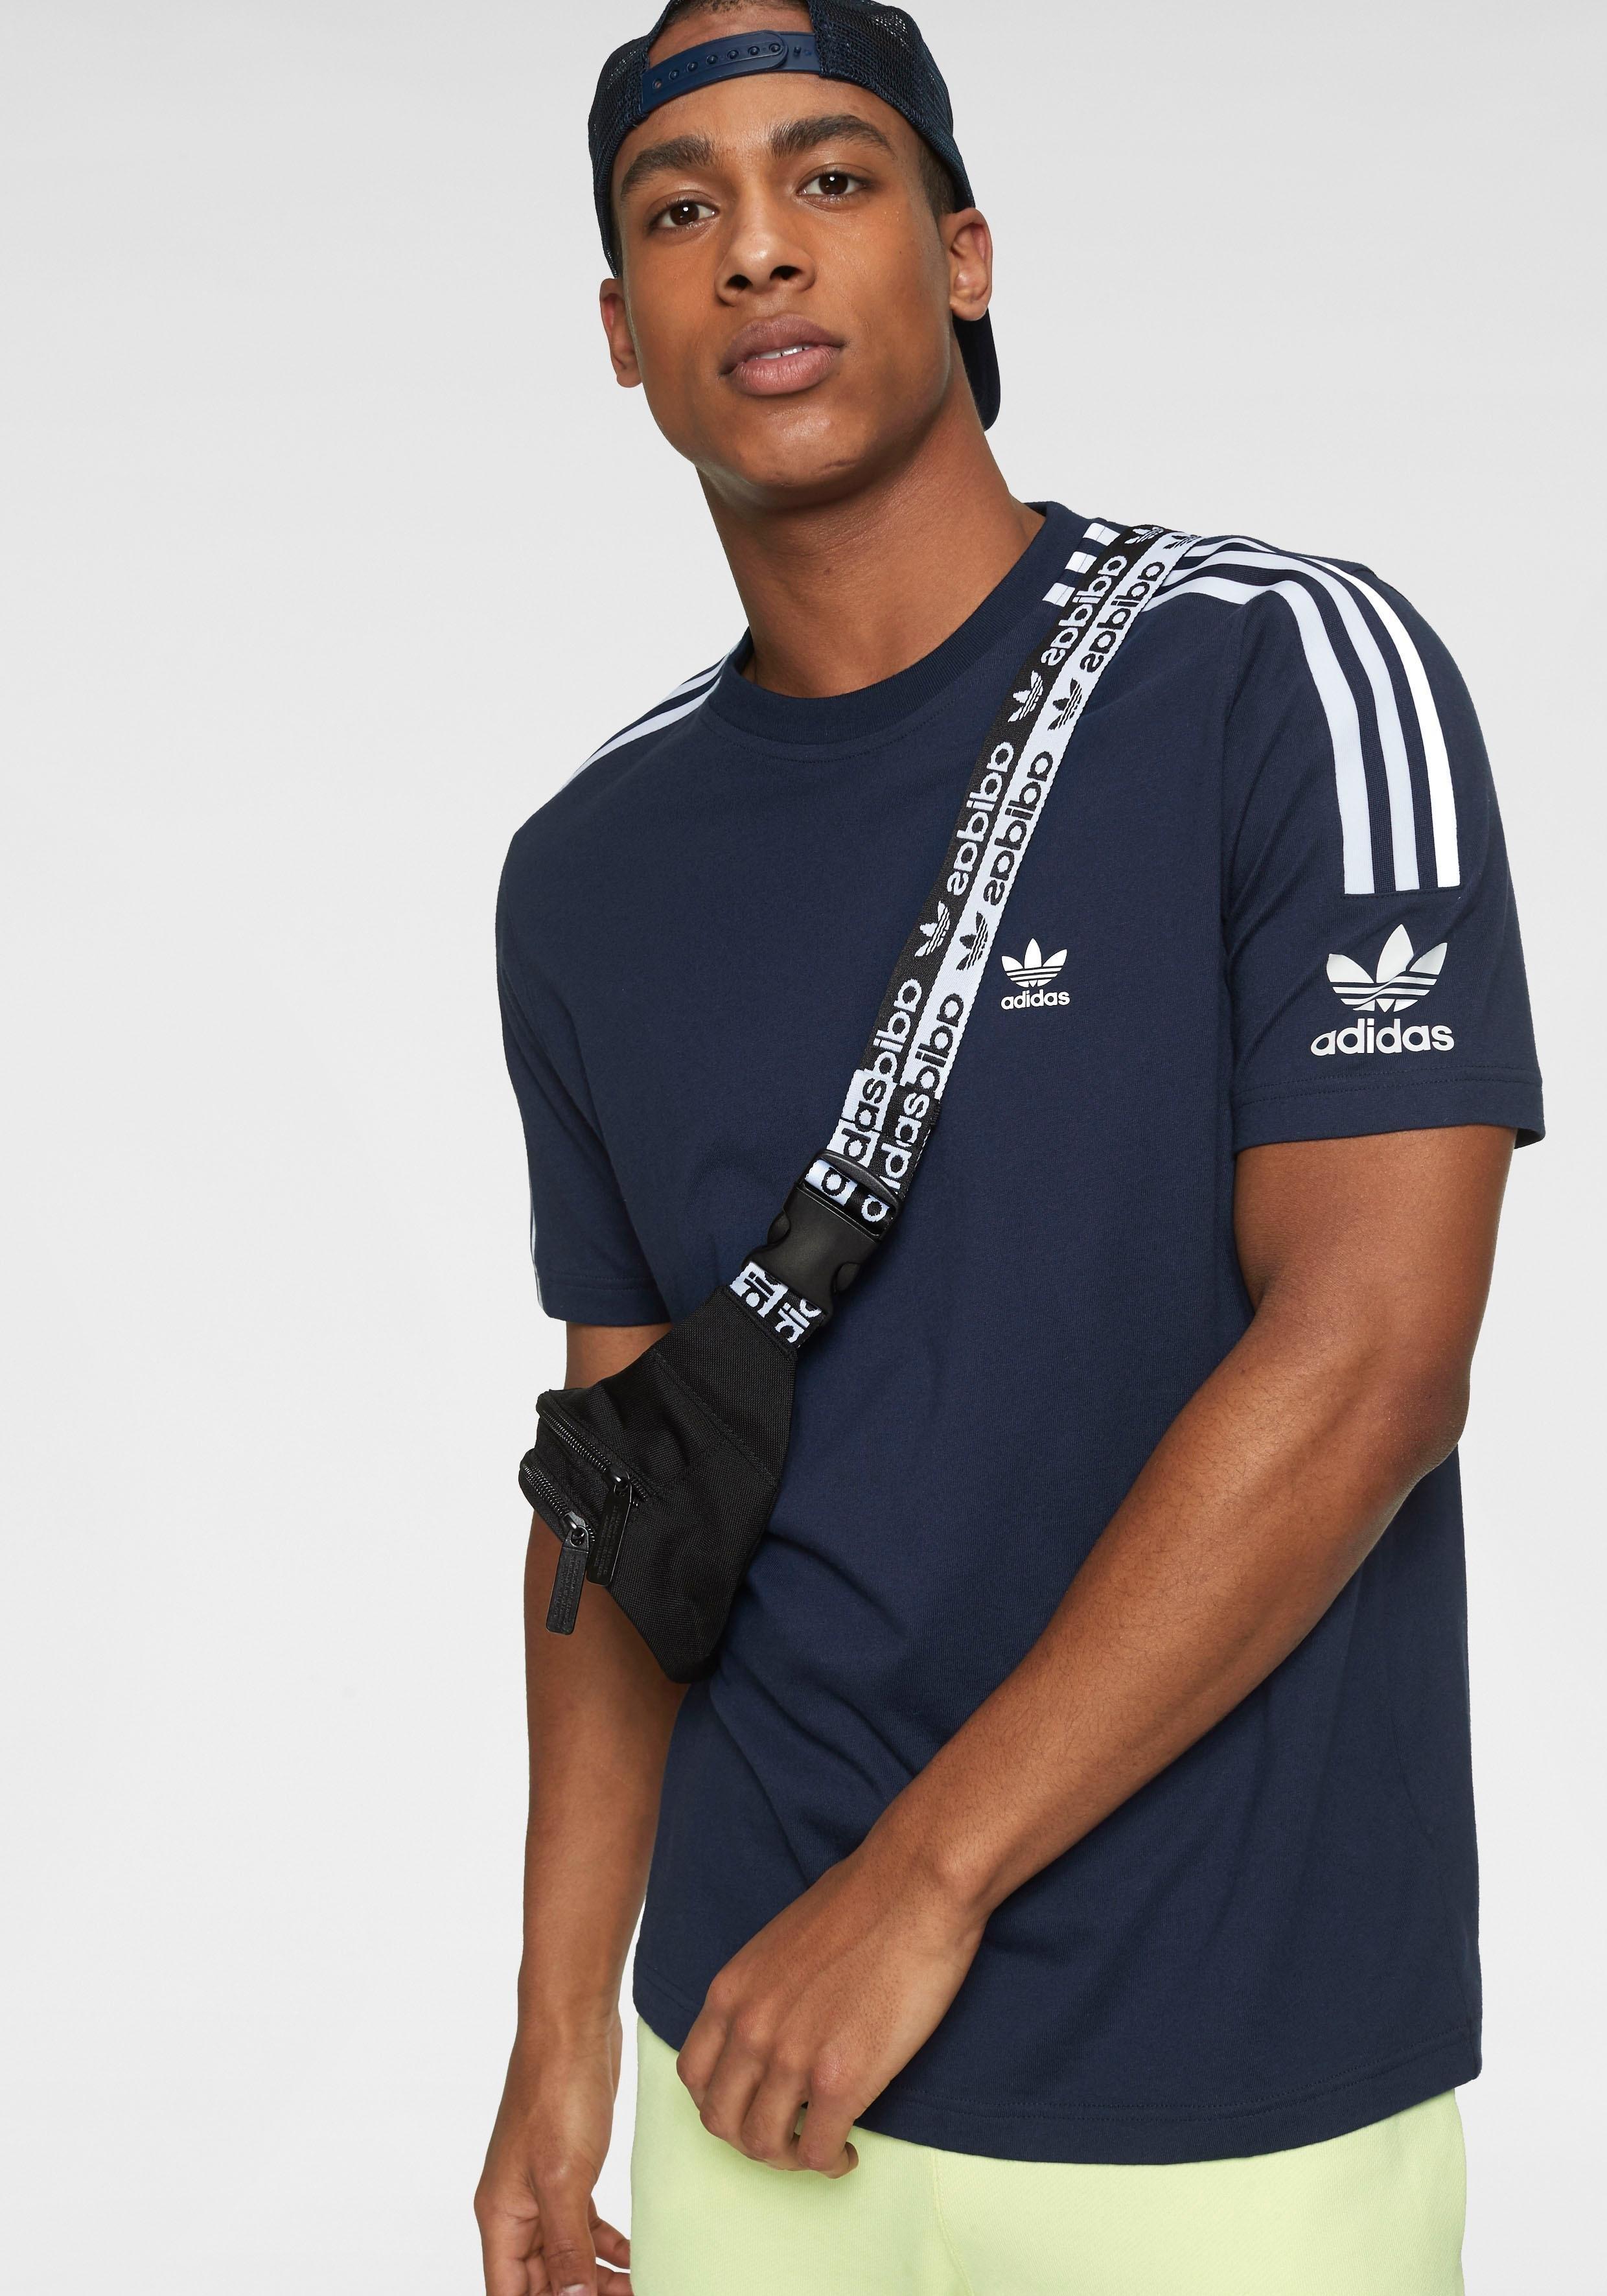 adidas Originals T-shirt »LOCK UP TEE« nu online bestellen